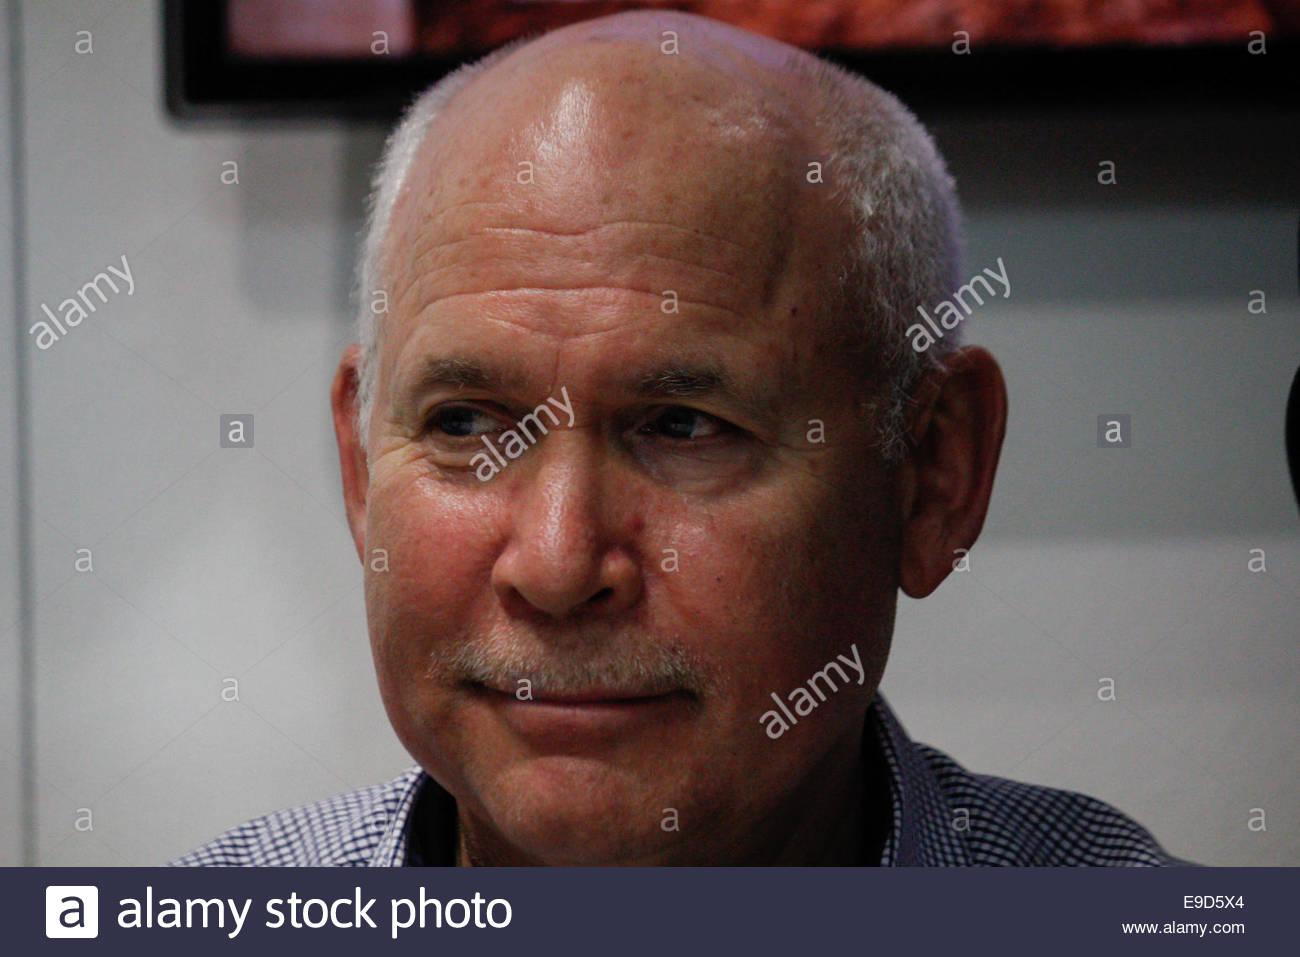 The Famous American Photographer Steve McCurry